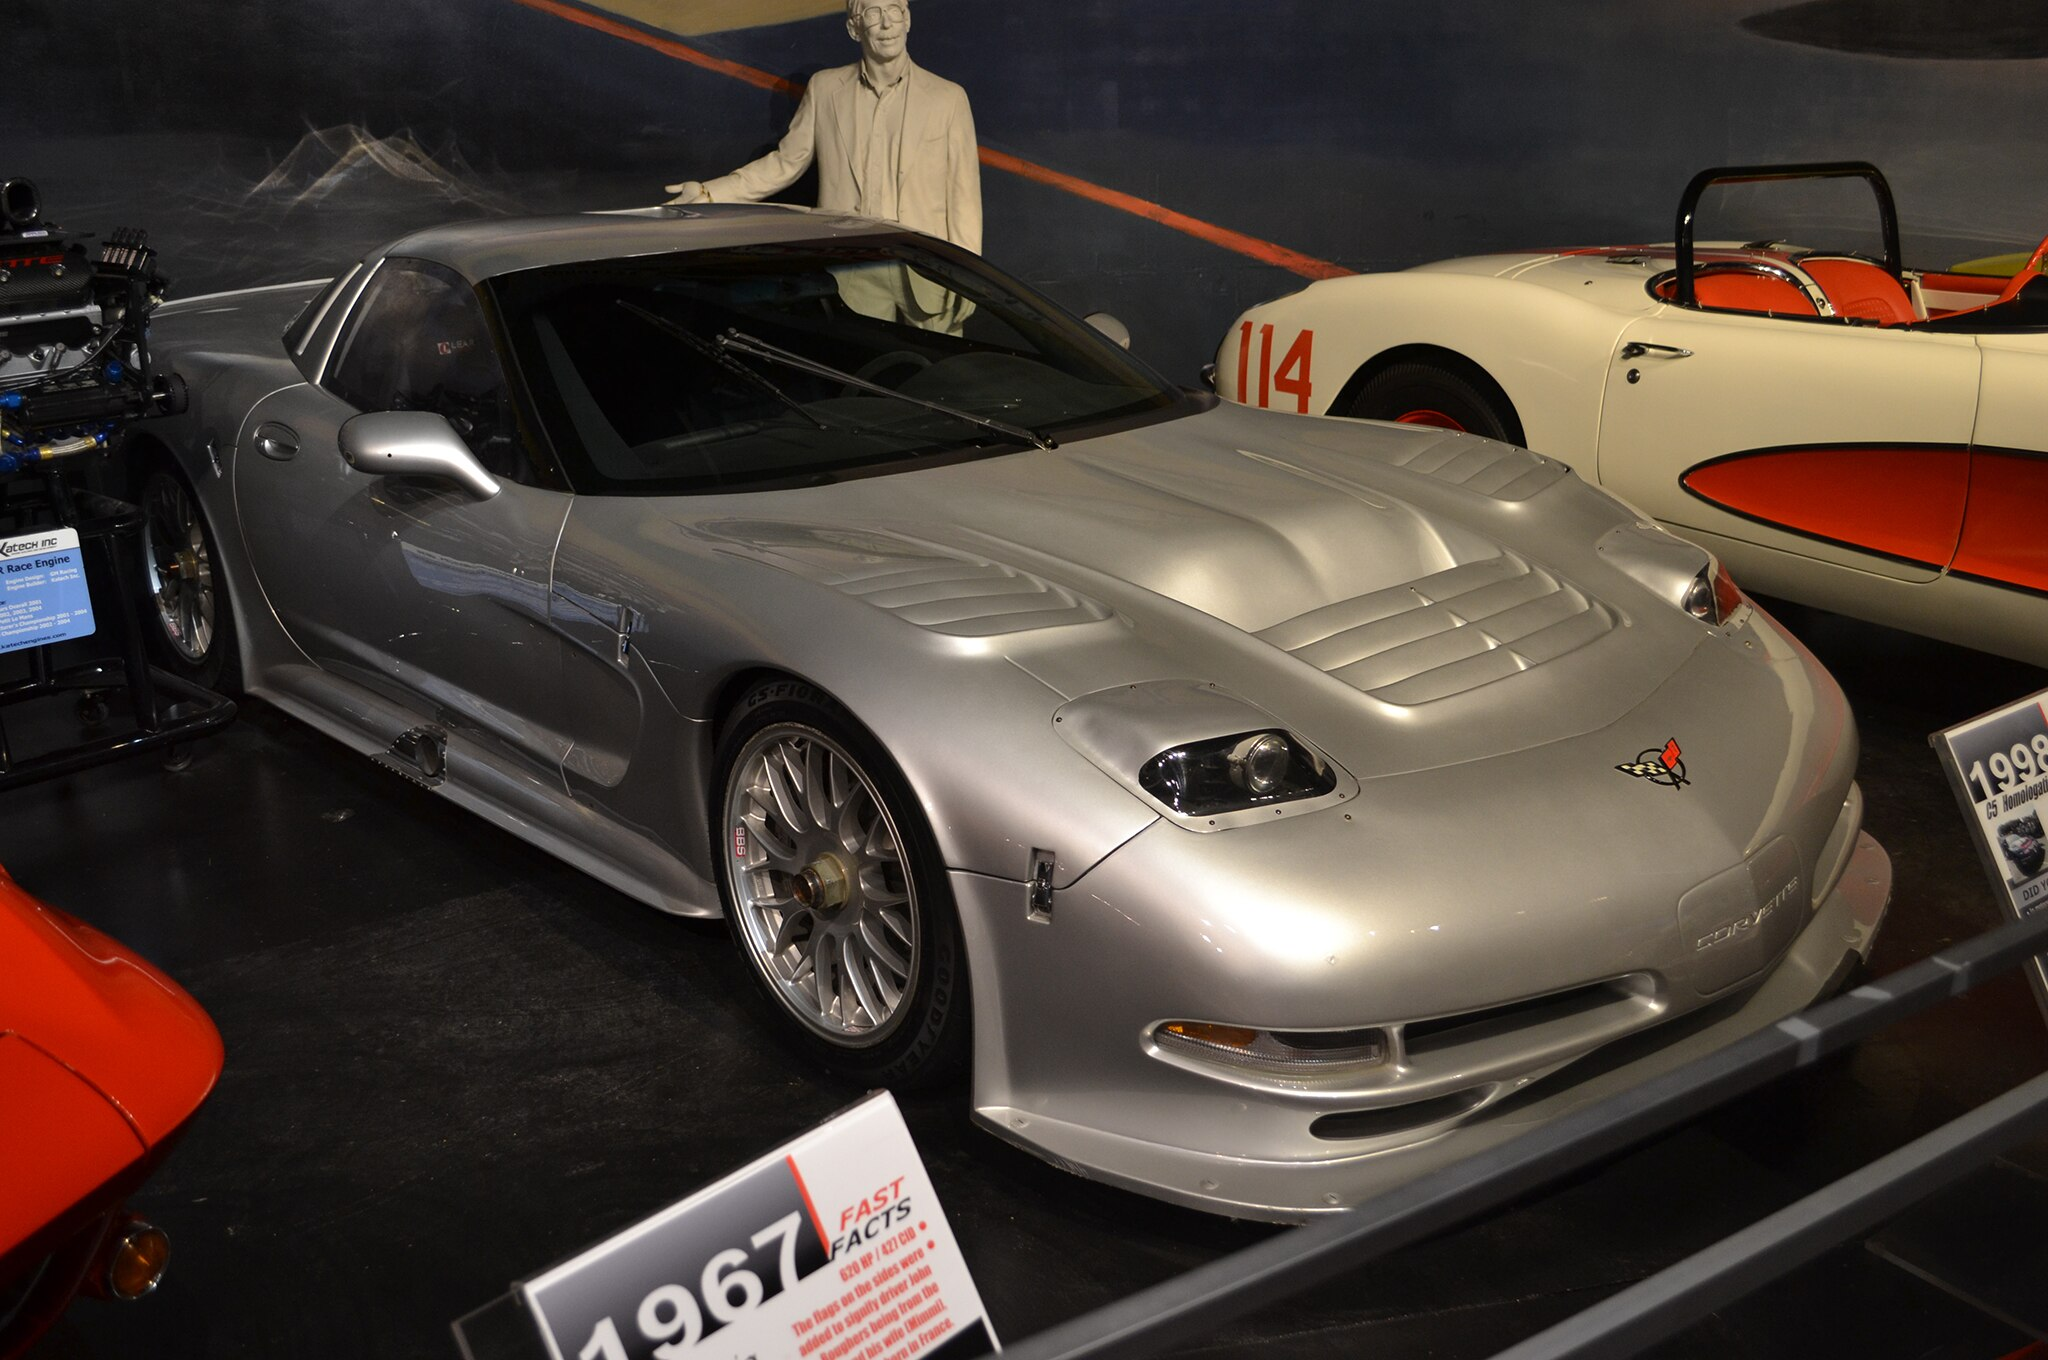 1998 Chevrolet C5 Corvette Homologation National Corvette Museum